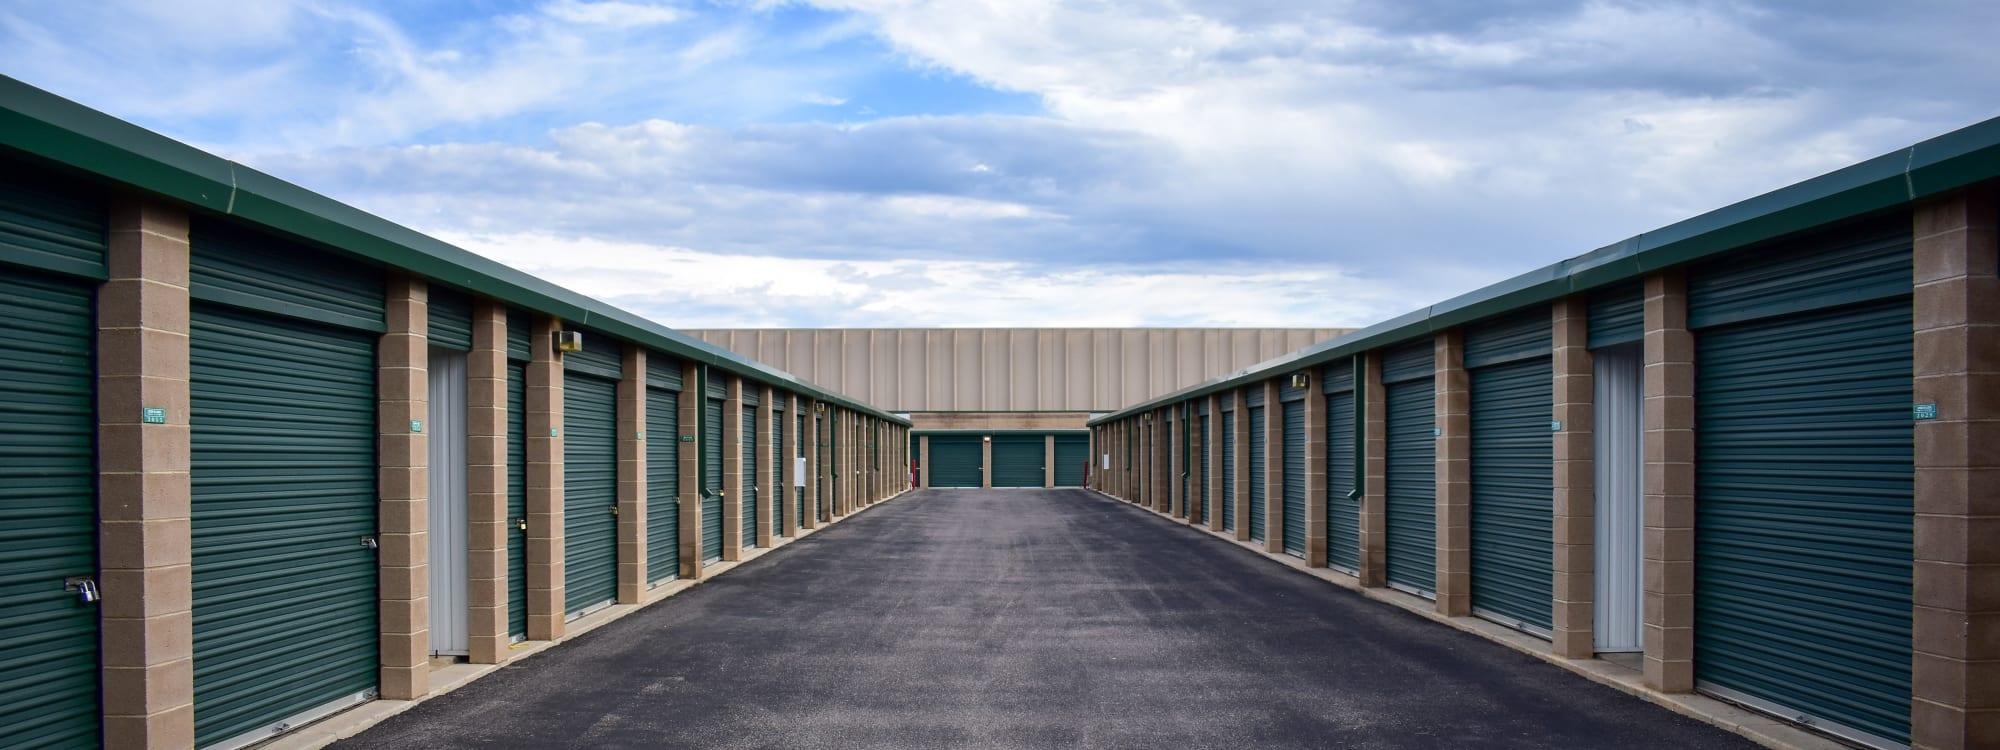 STOR-N-LOCK Self Storage in Littleton, Colorado